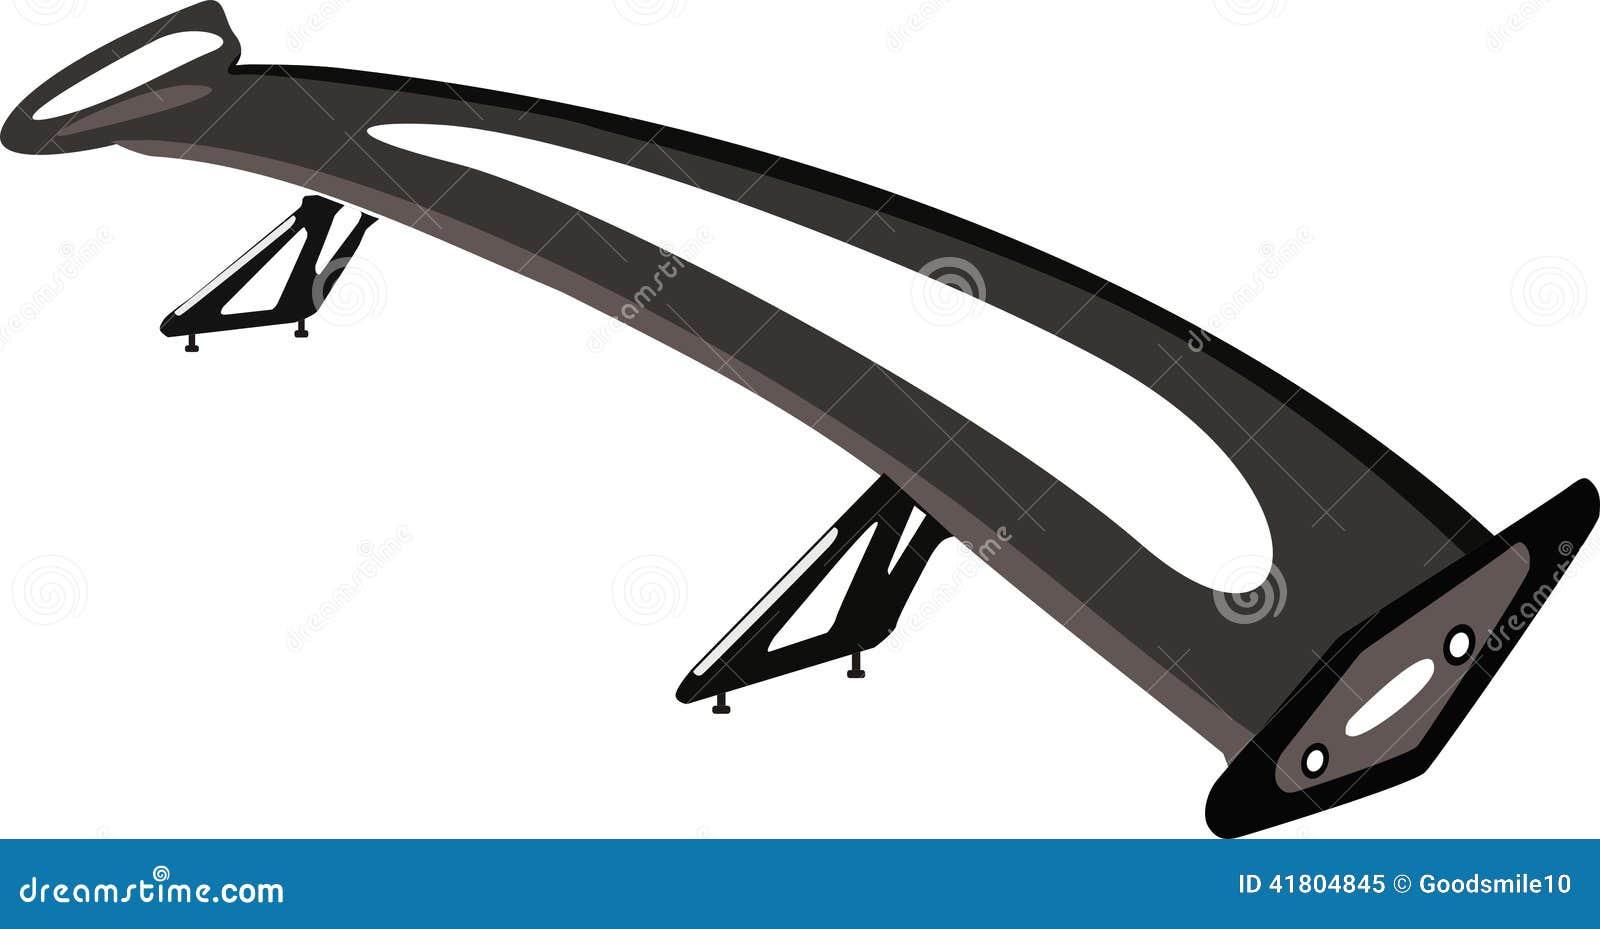 Car S Spoiler Stock Image Image Of Windncar Sports 41804845